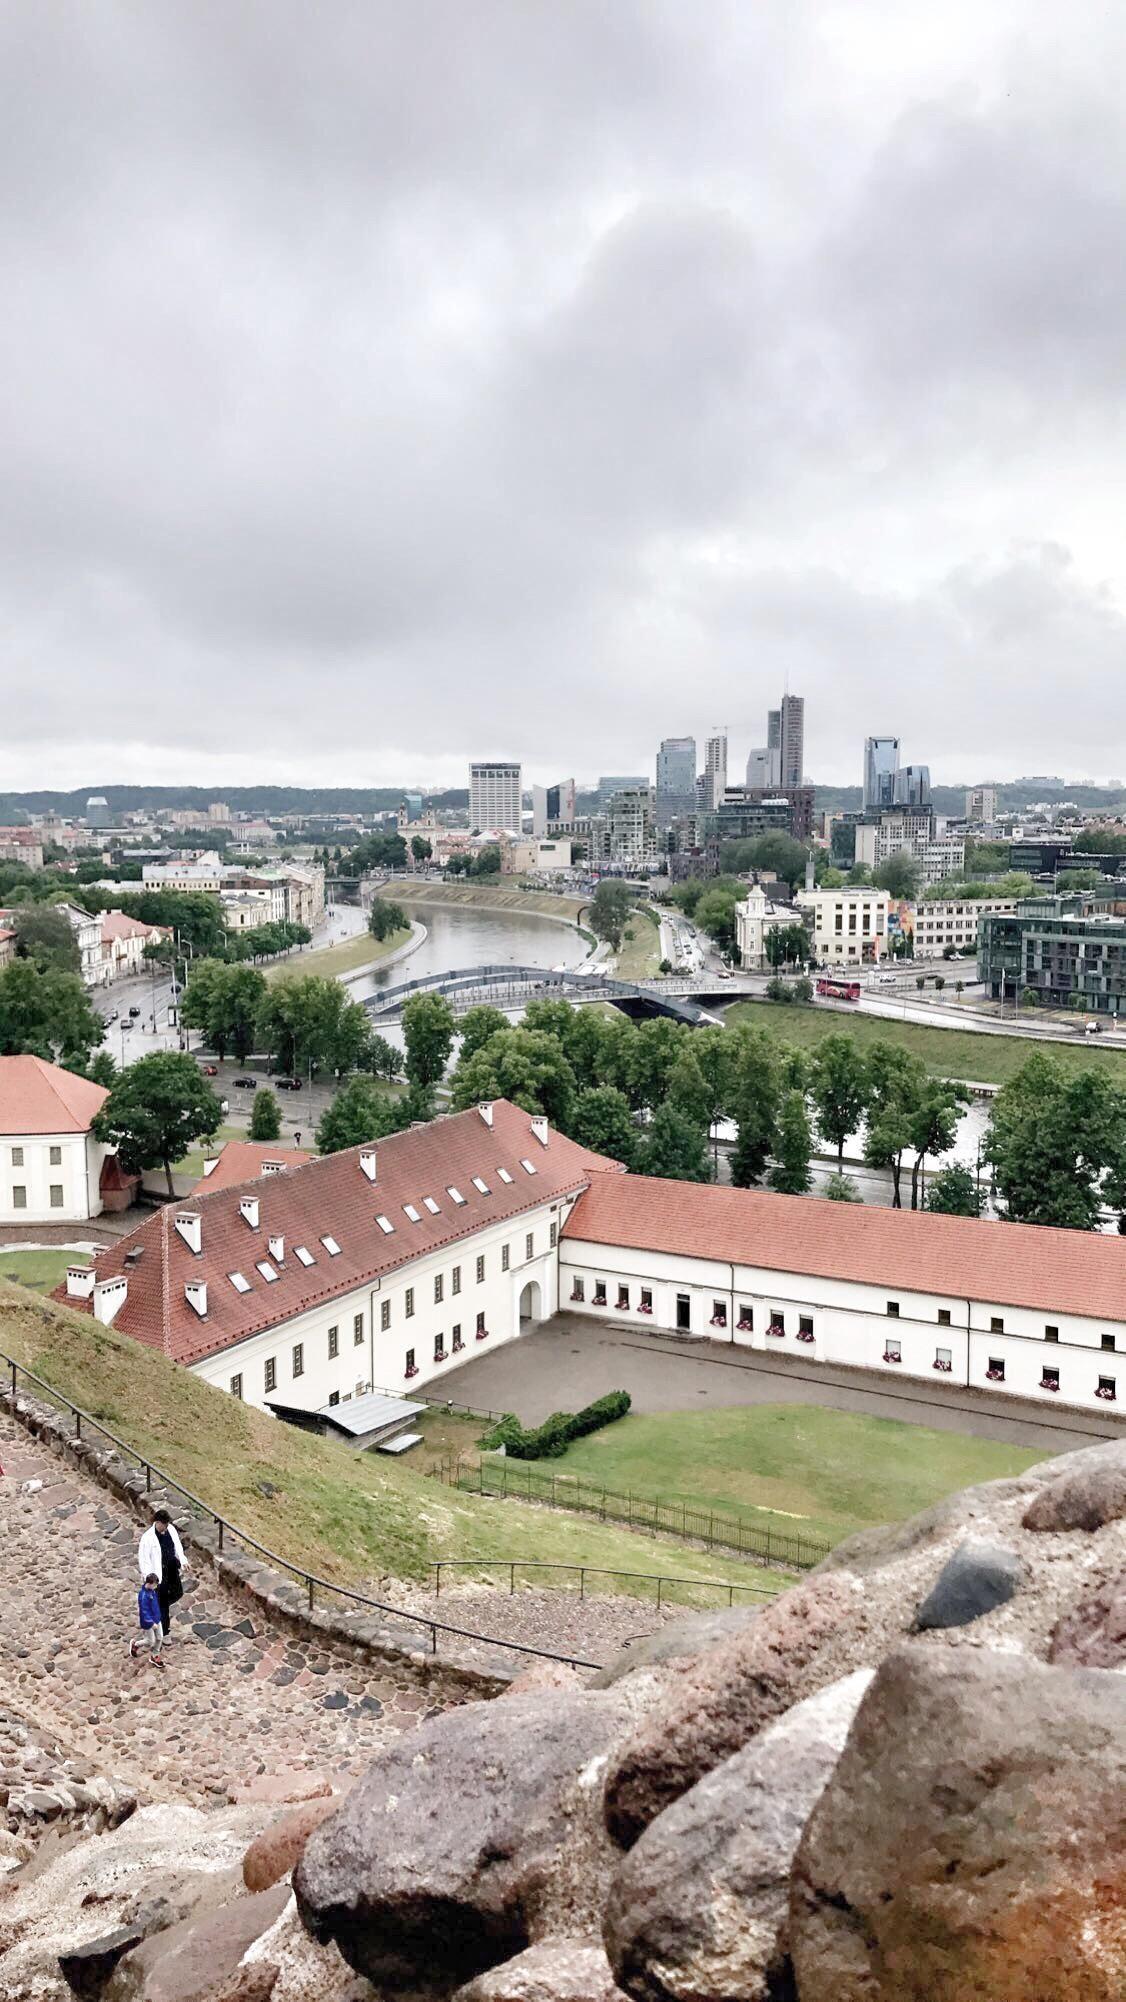 Vilnius Lithuania #travel #ttot #nature #photo #vacation #Hotel #adventure #landscape http://bit.ly/2roMtc5